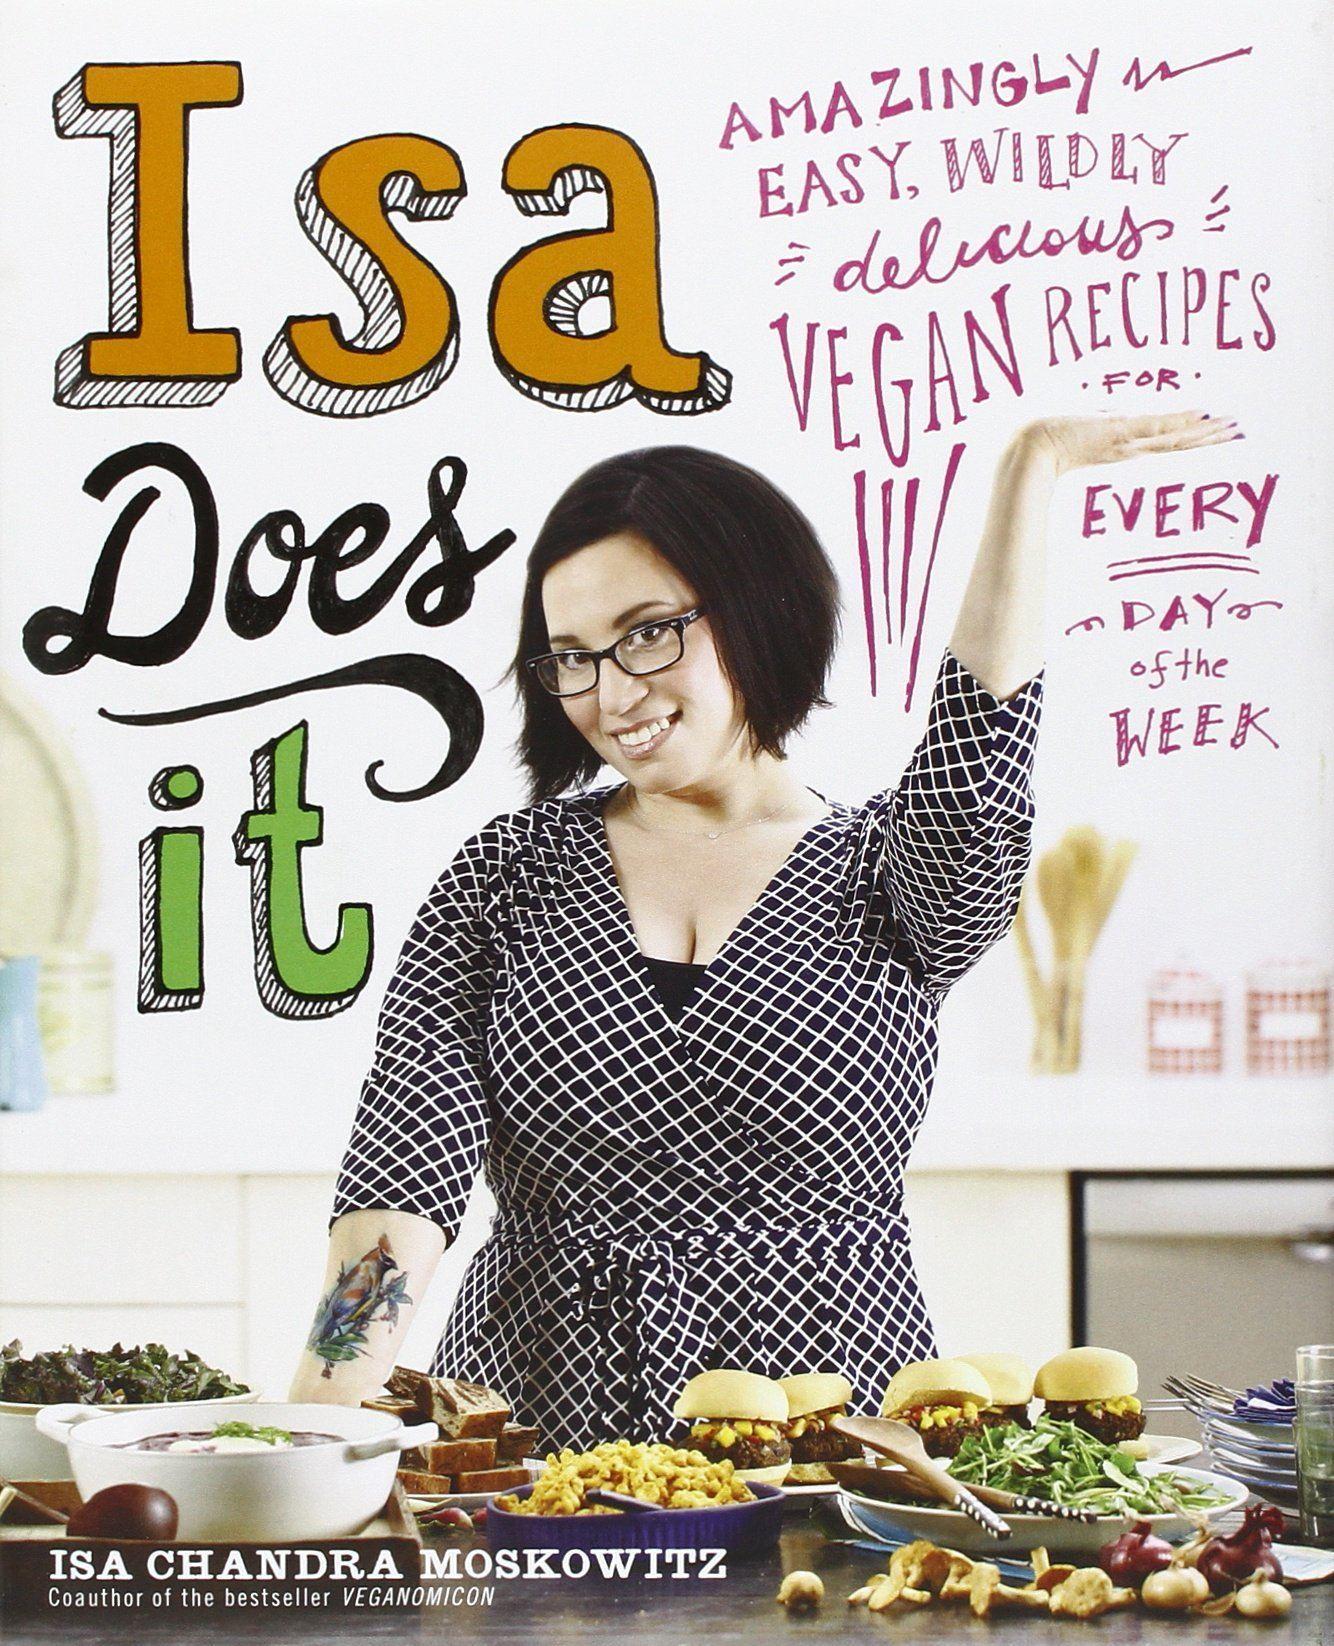 Isa Does It - Amazingly Easy